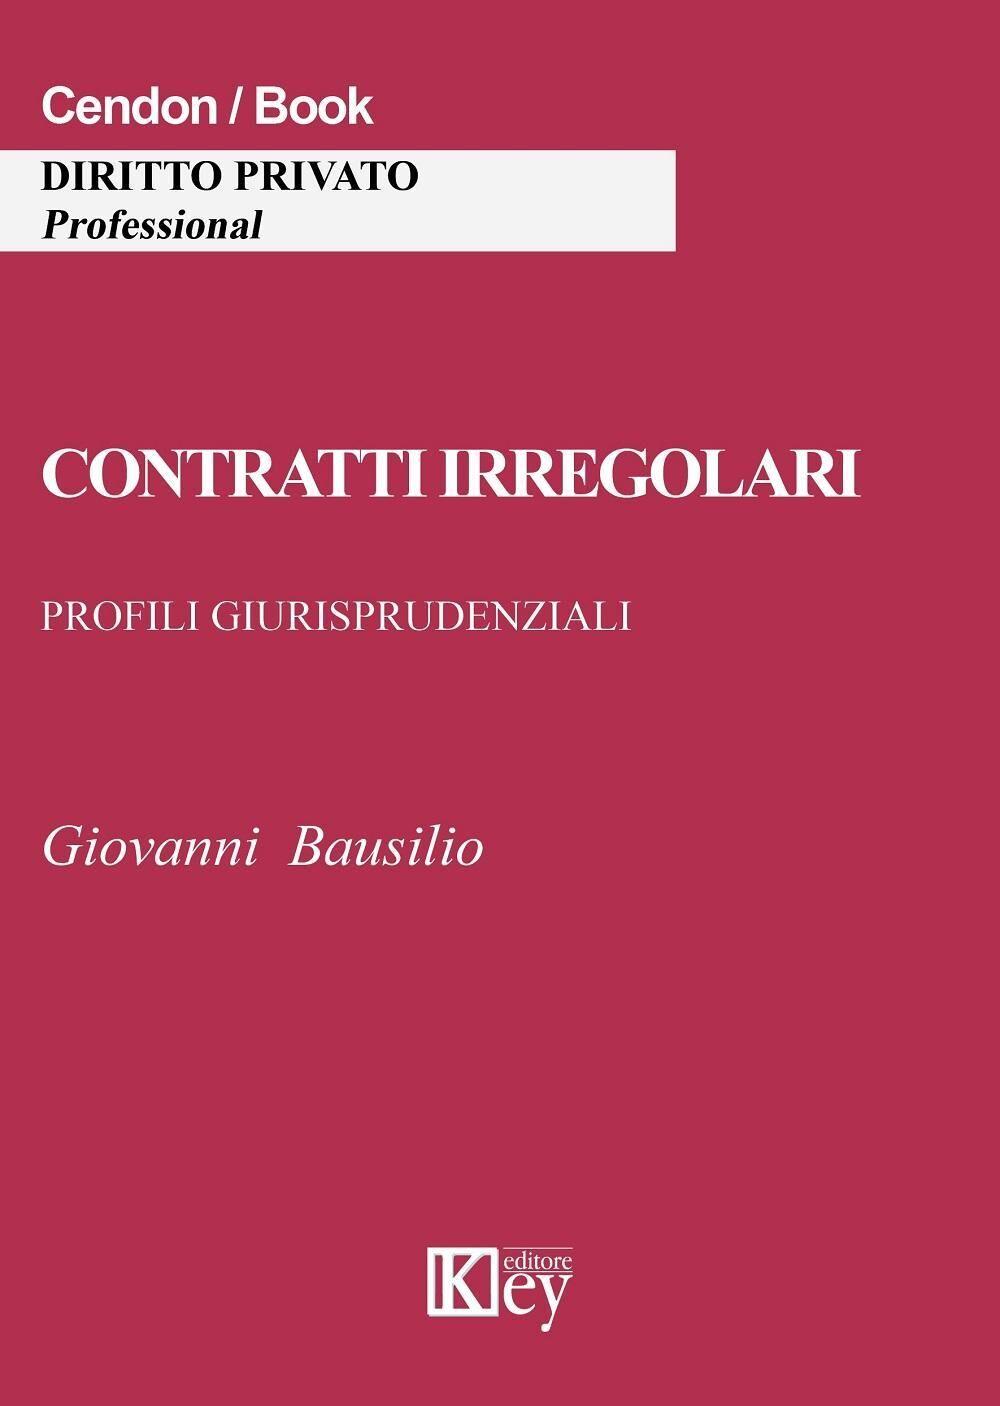 Contratti irregolari. Profili giurisprudenziali